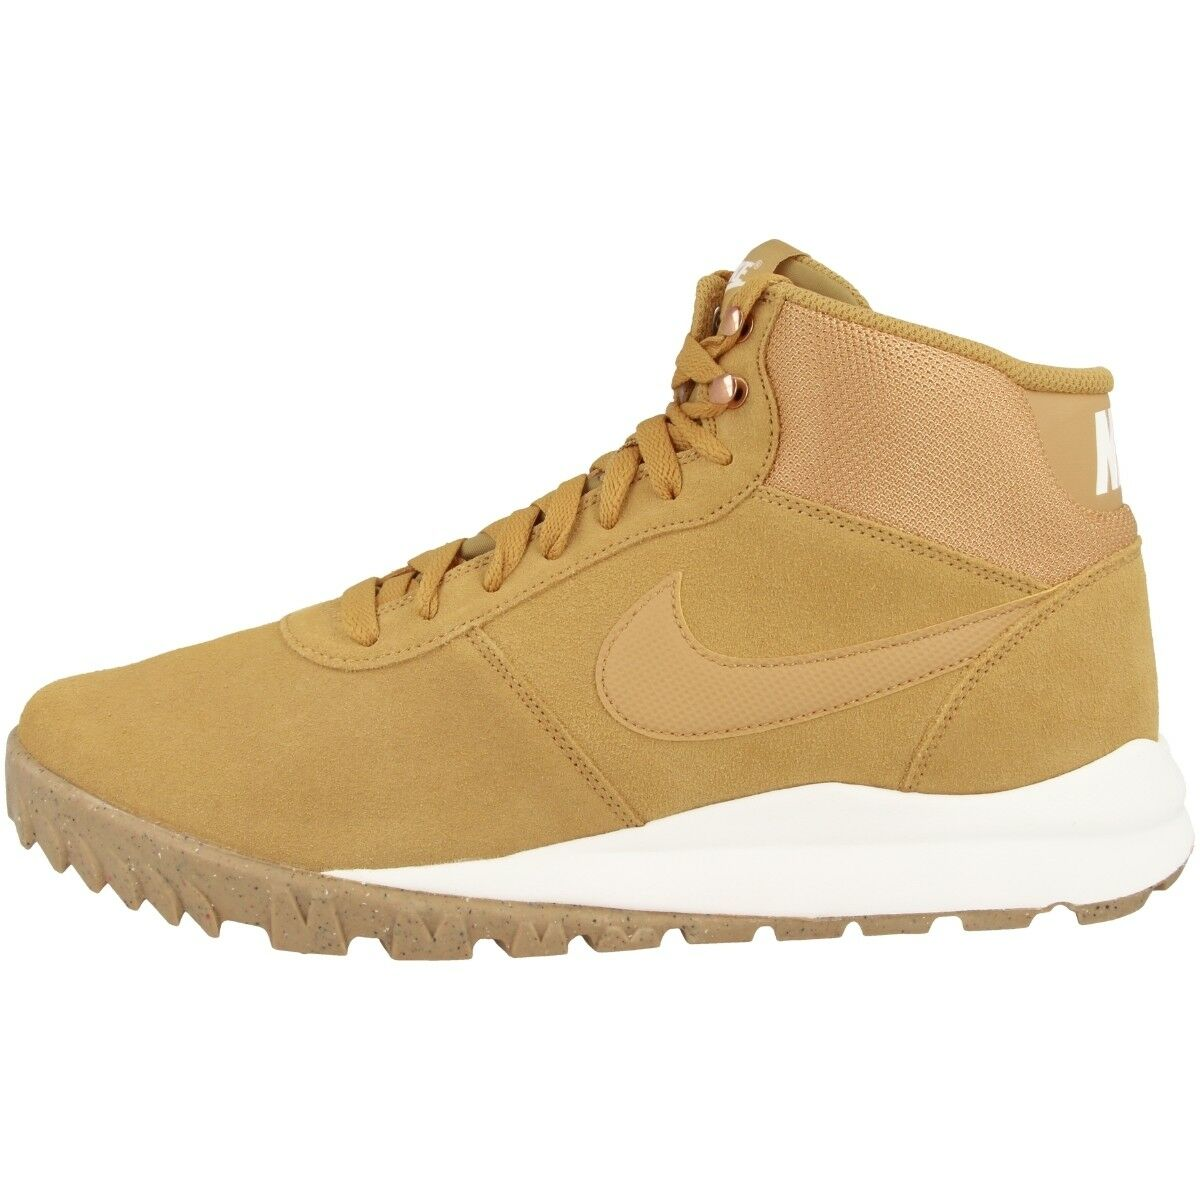 Nike Hoodland Boots Stivali Invernali Pagliaio Beige 654888-727 Manoa